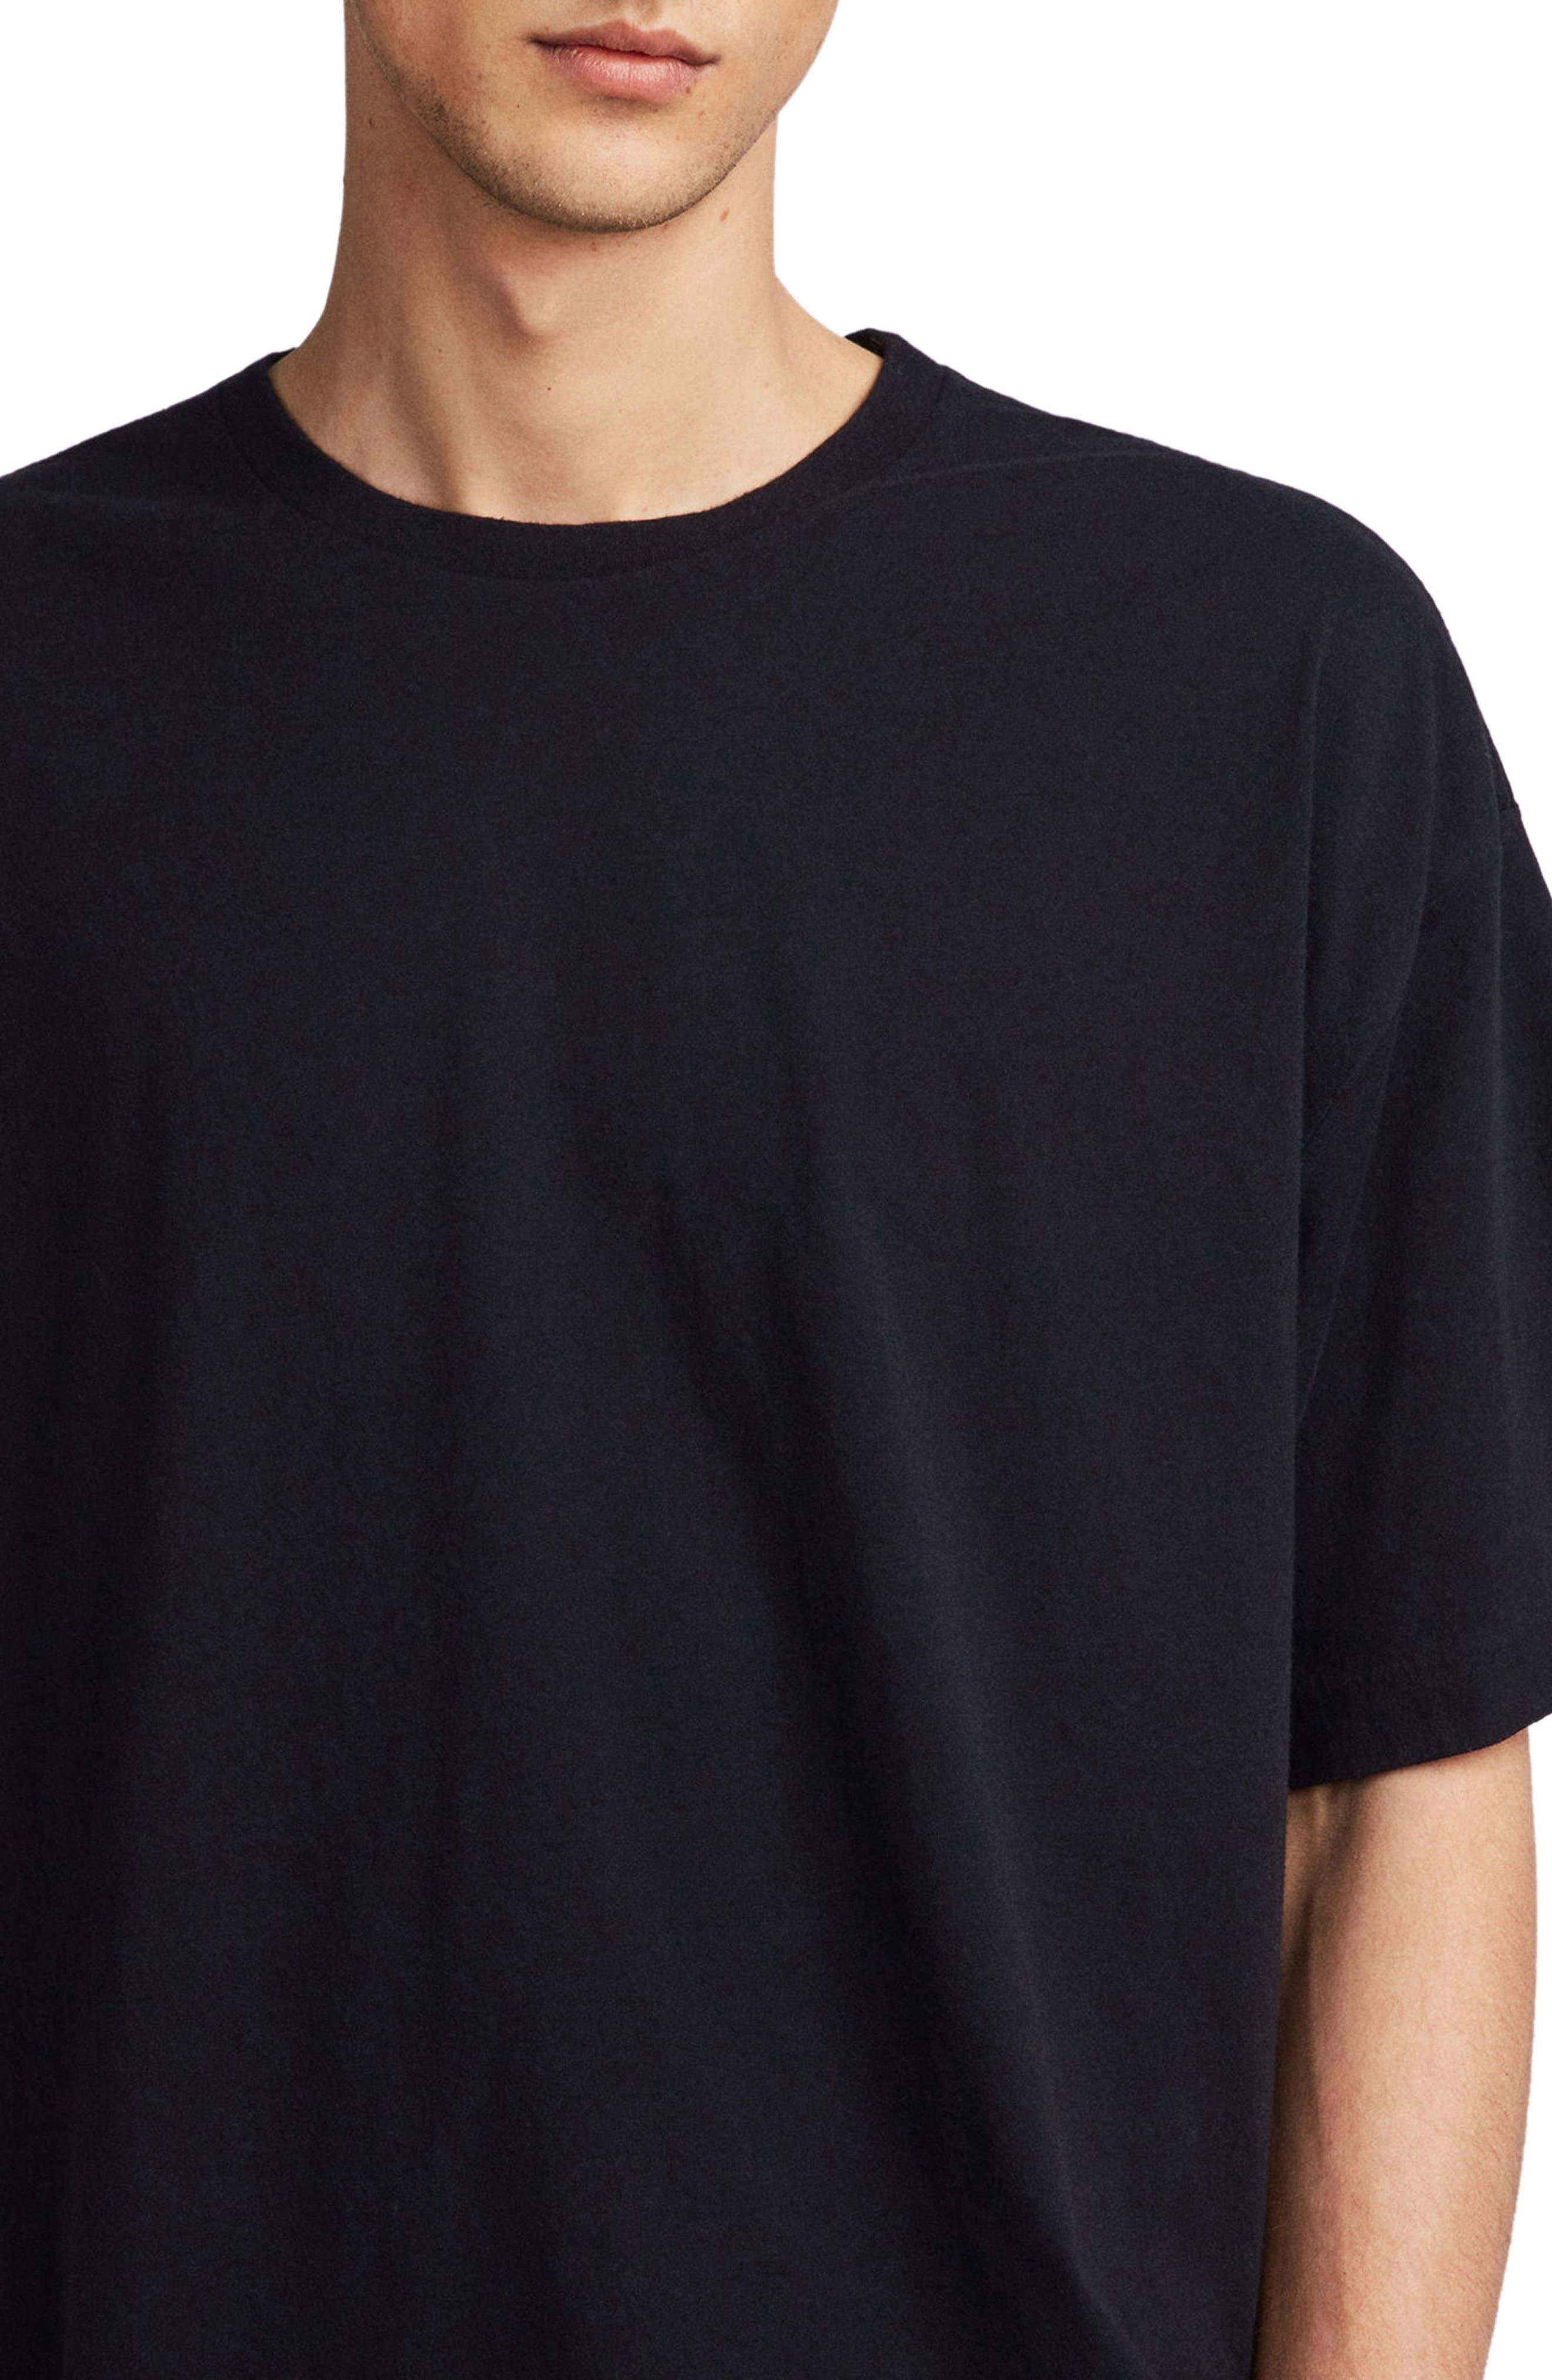 Atnom Crewneck T-Shirt,                             Alternate thumbnail 4, color,                             003